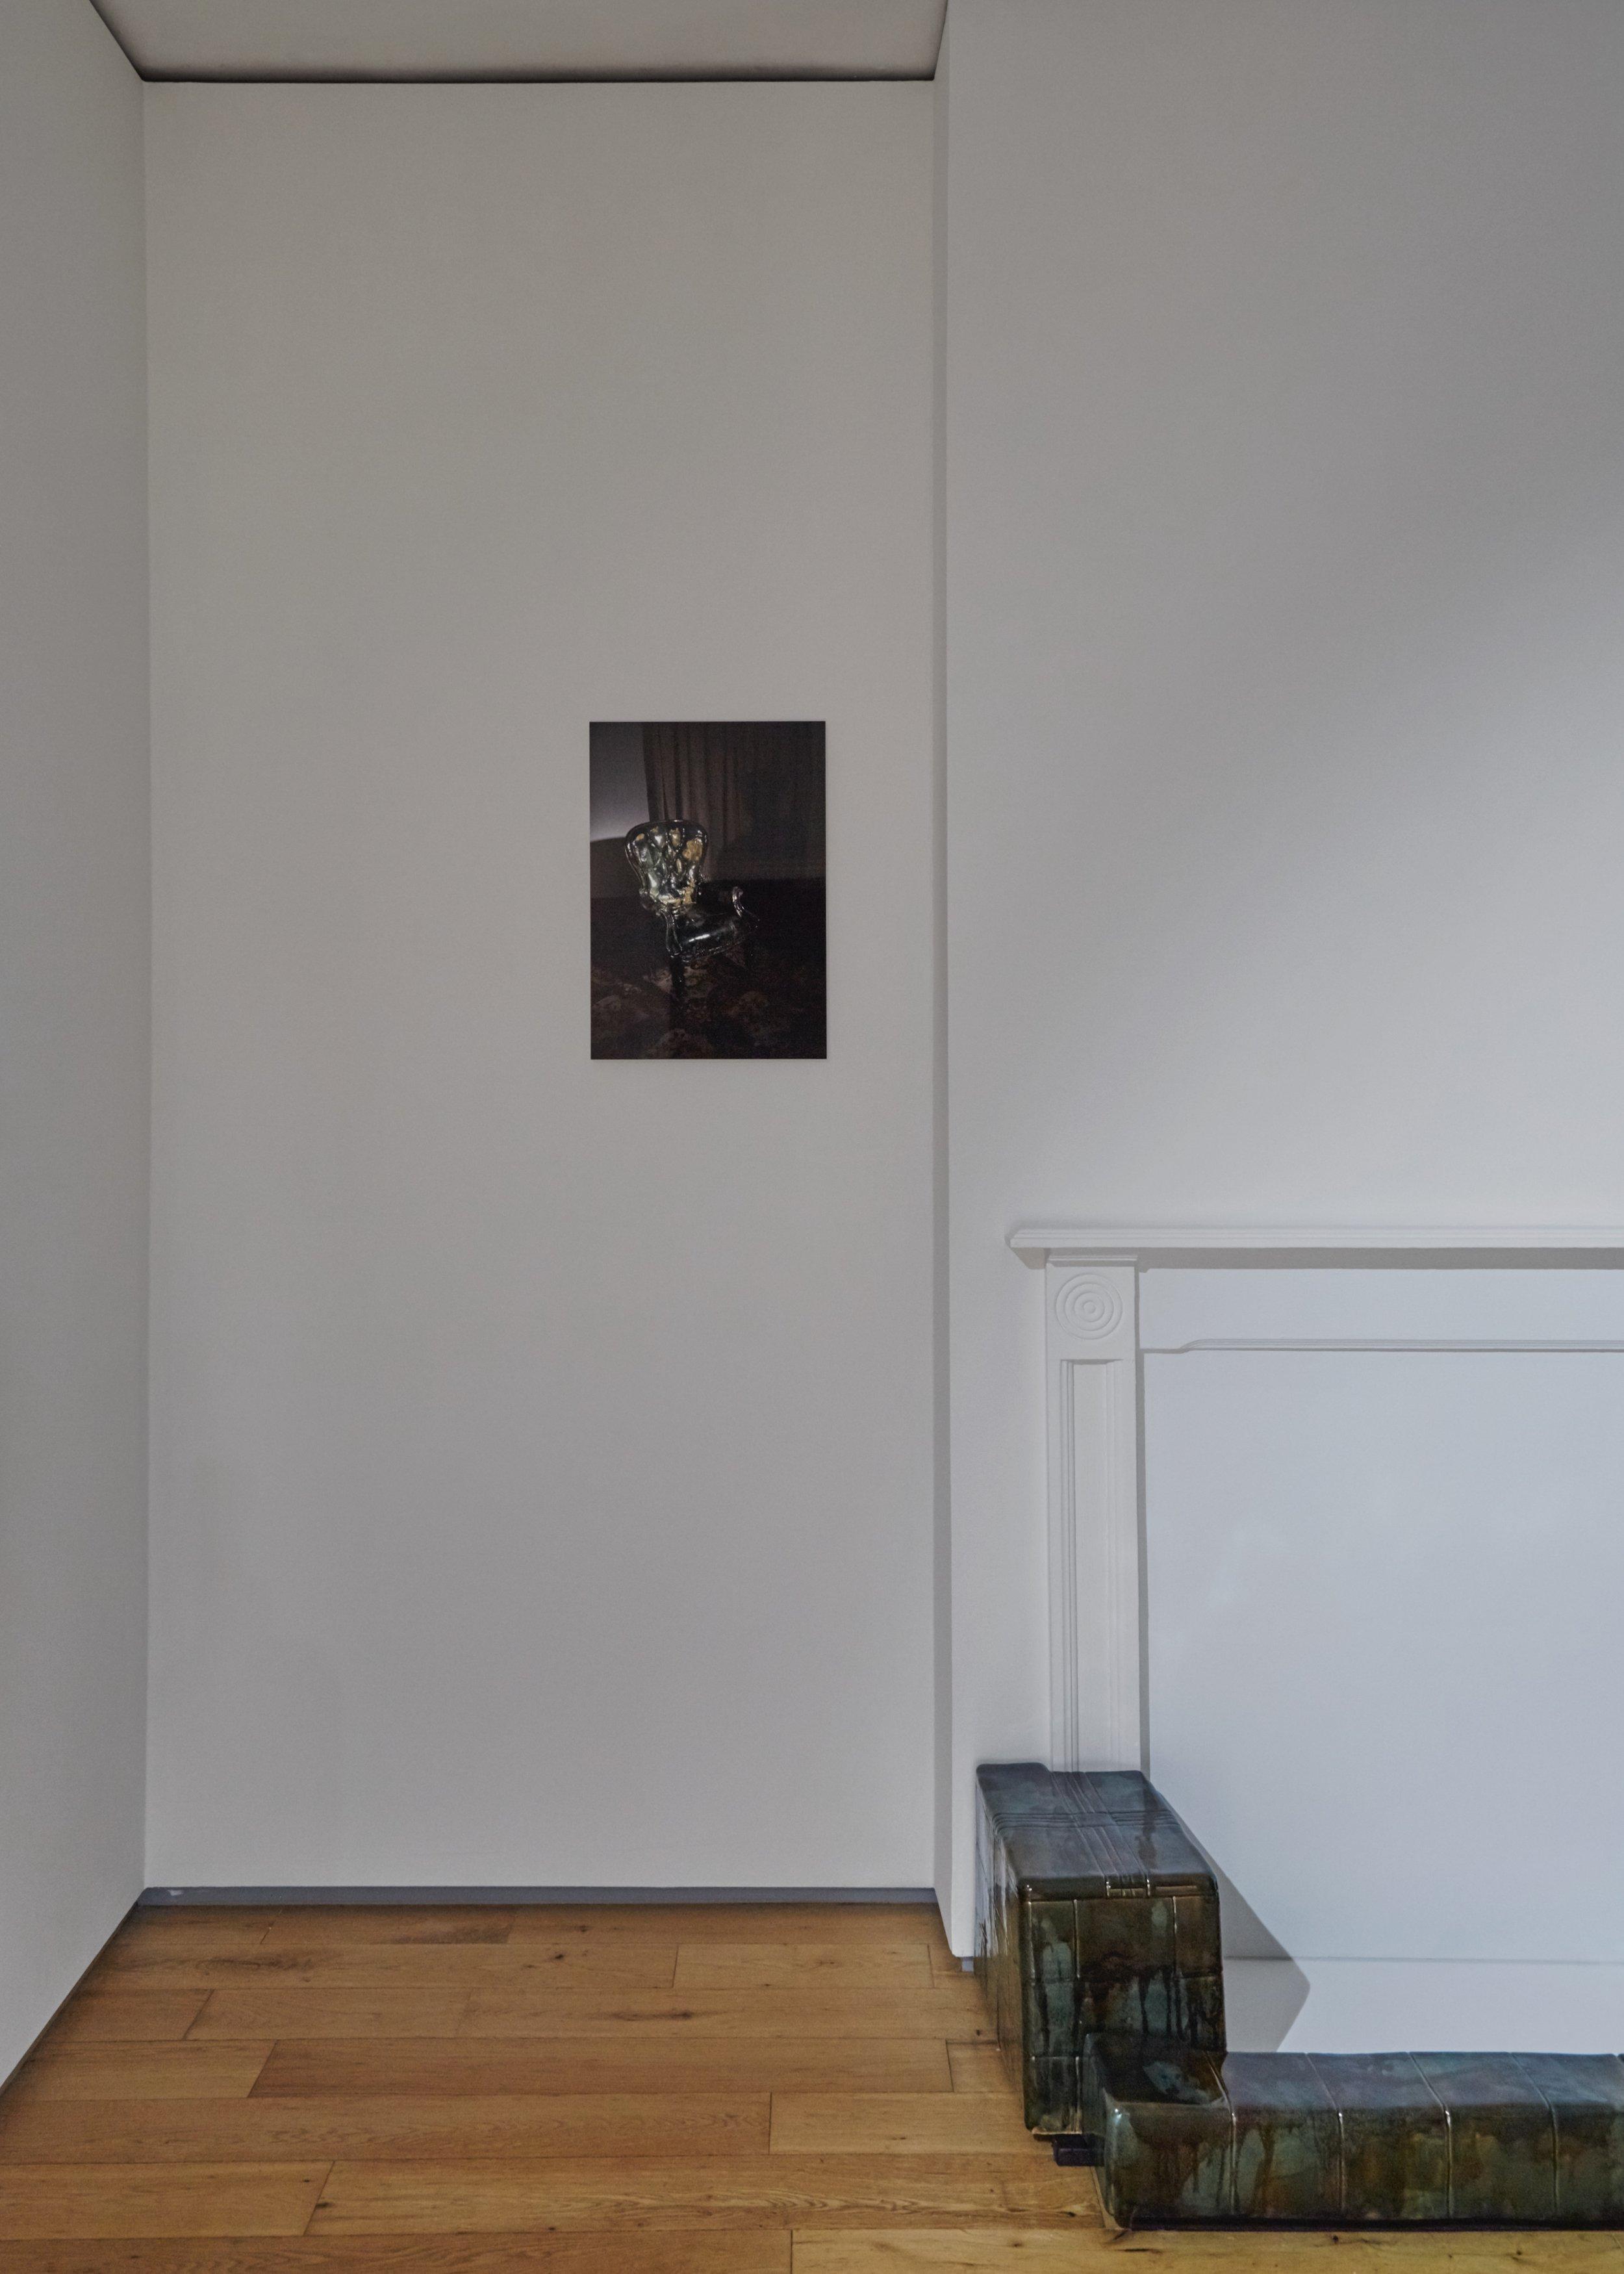 Visitor,  2019 Fujiflex print on aluminium dibond 36 x 50 cm   Strange Comfort (fire surround),  2019 Stoneware ceramic and glaze 28 x 135 x 52 cm